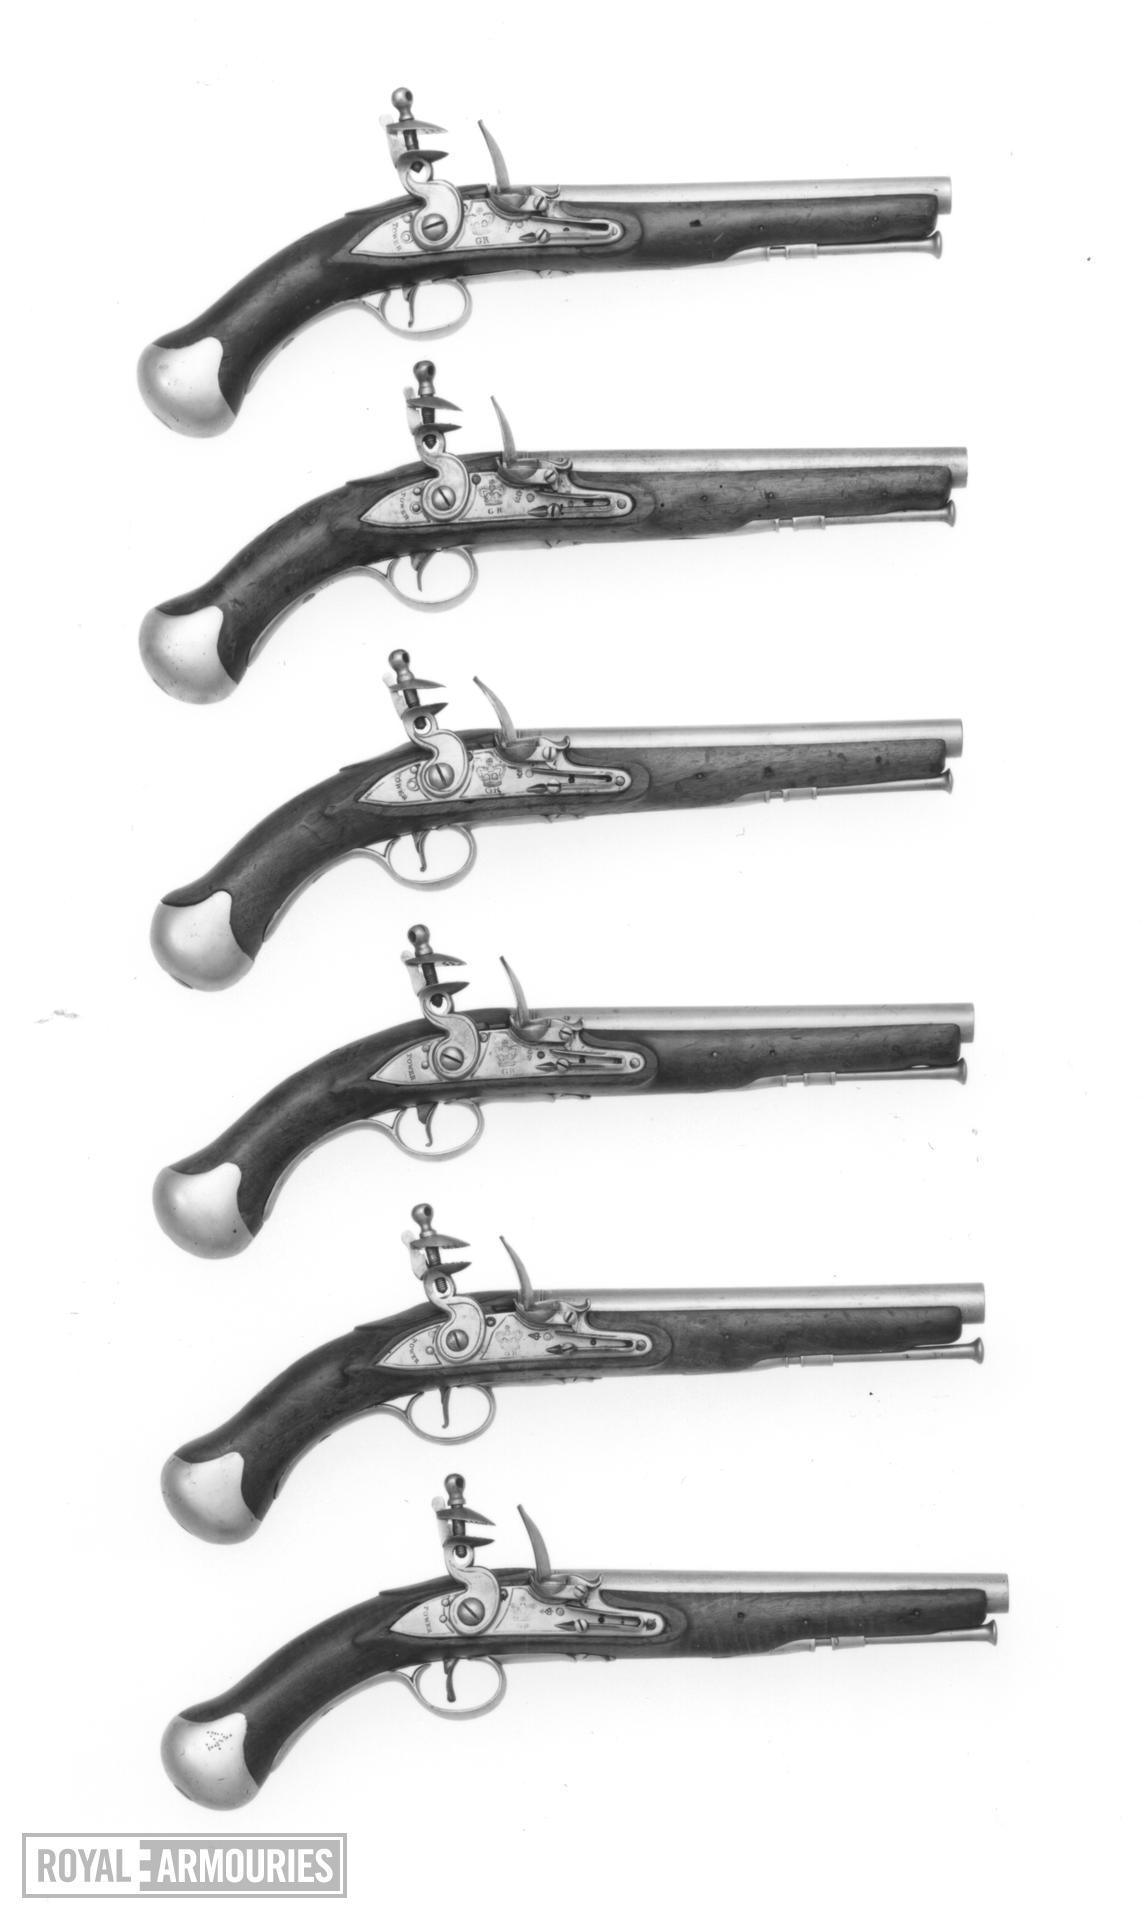 Flintlock military pistol - Sea Service Pattern